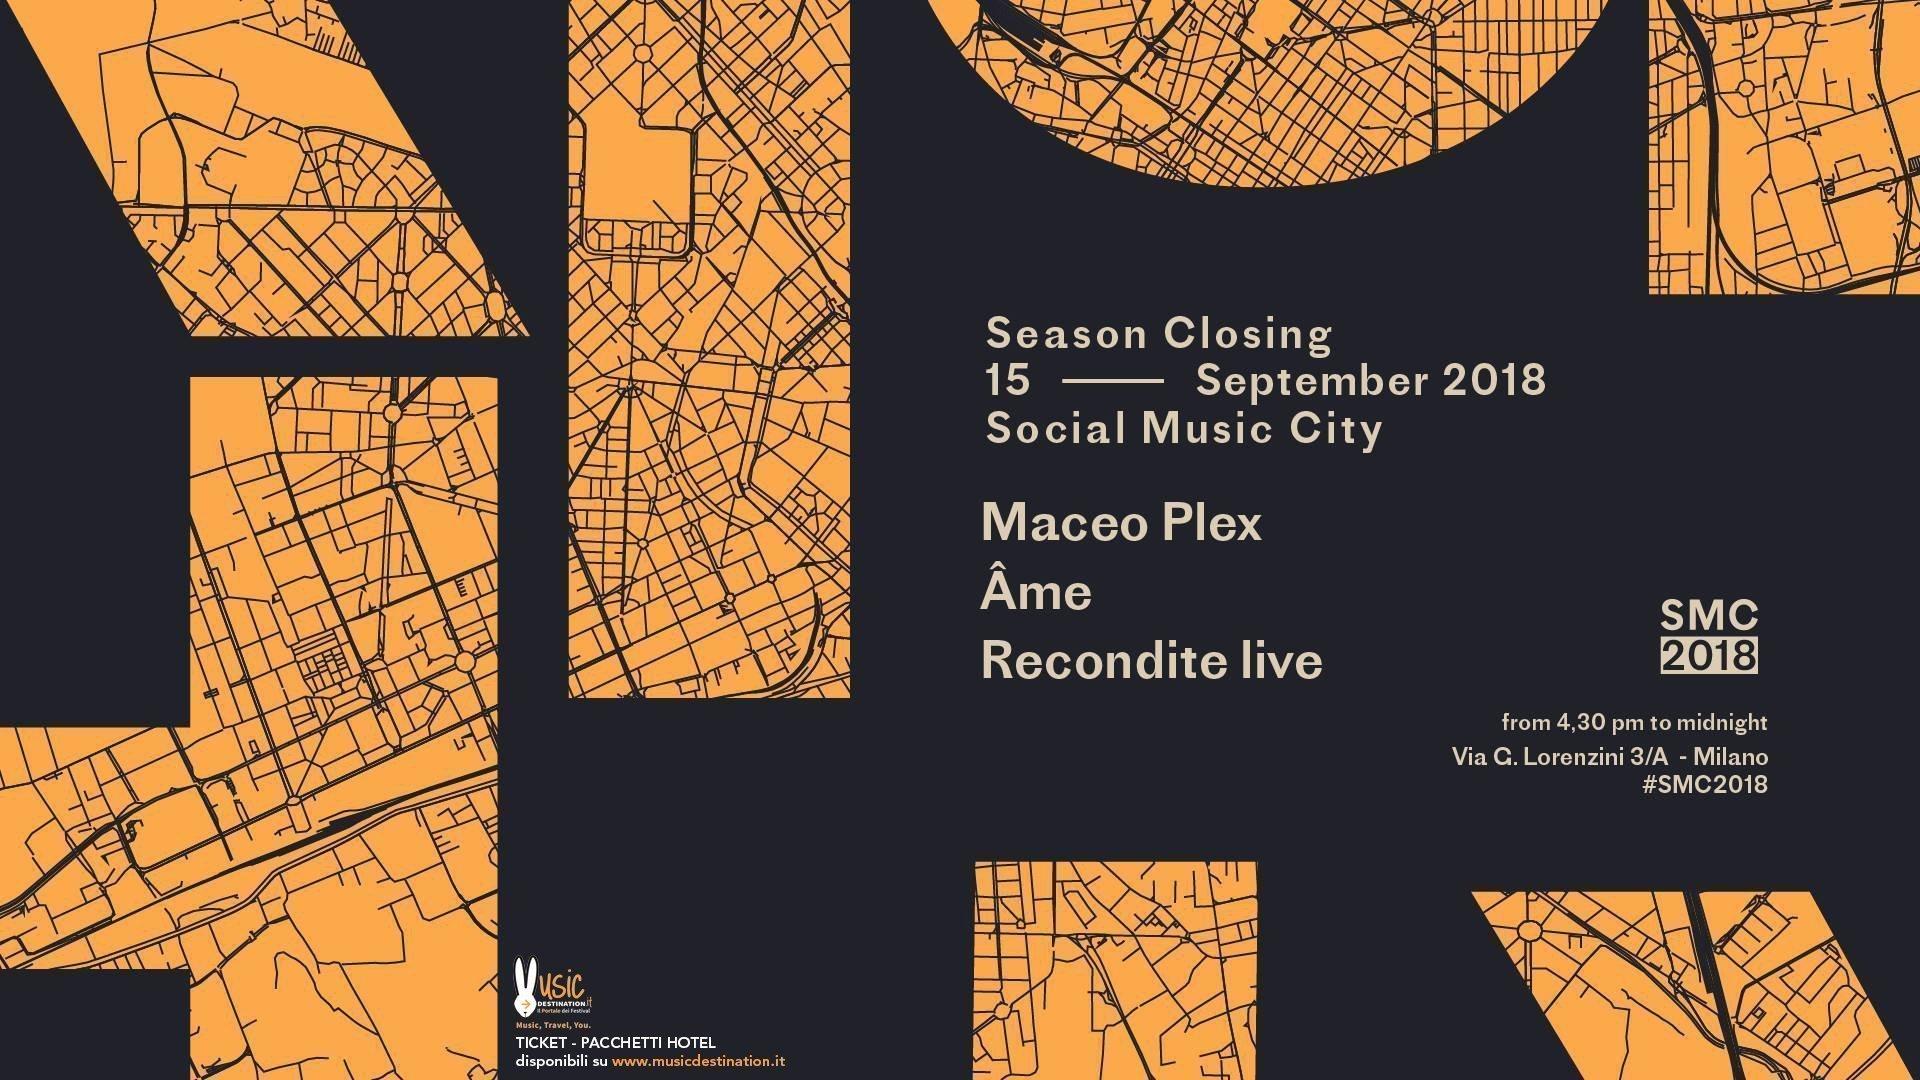 Maceo Plex Social Music City 15 Settembre 2018